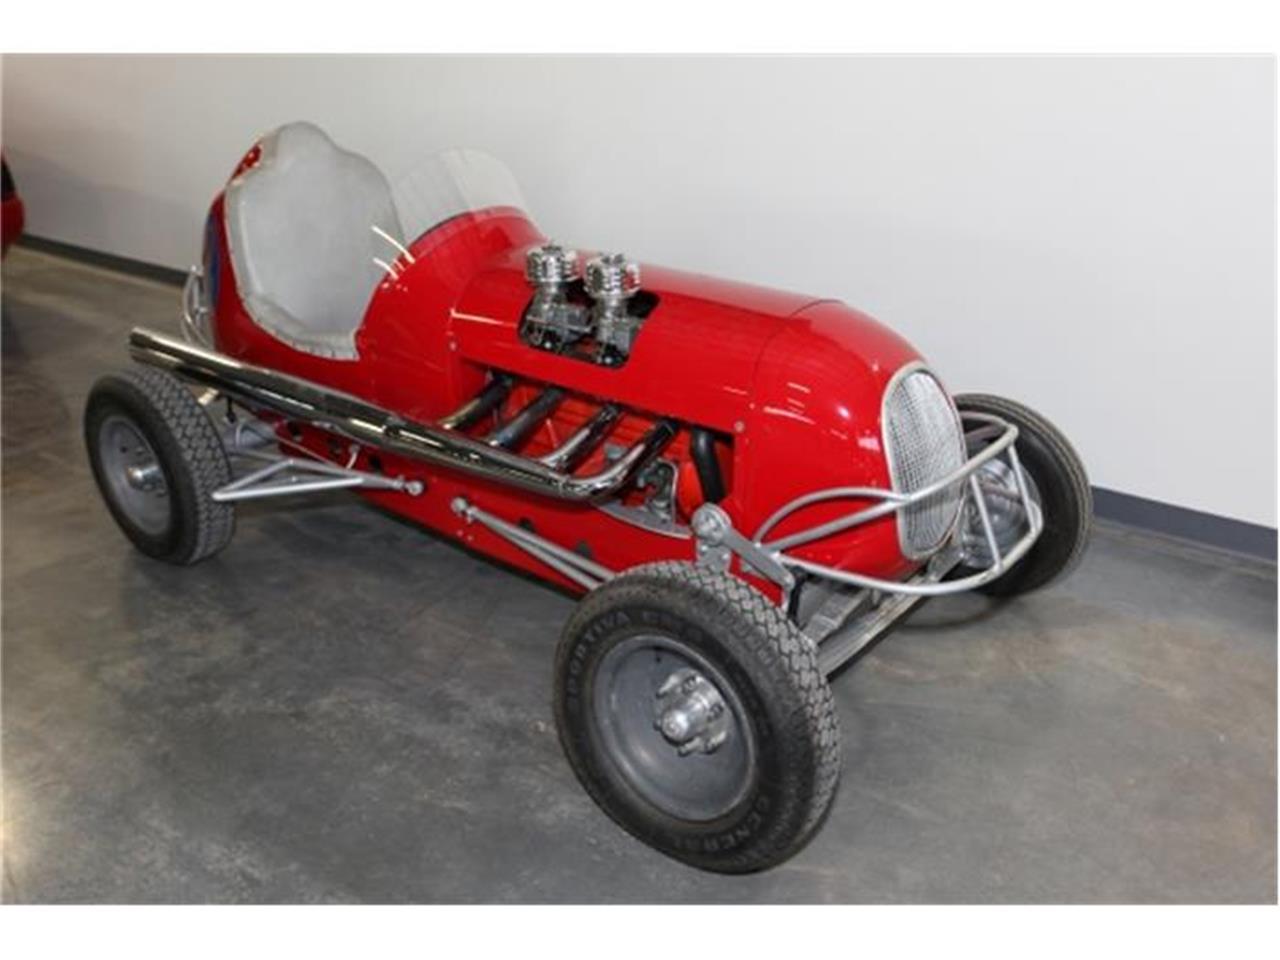 Large Picture of Classic '49 Midget Racing Car located in Branson Missouri - $21,000.00 - DSCP